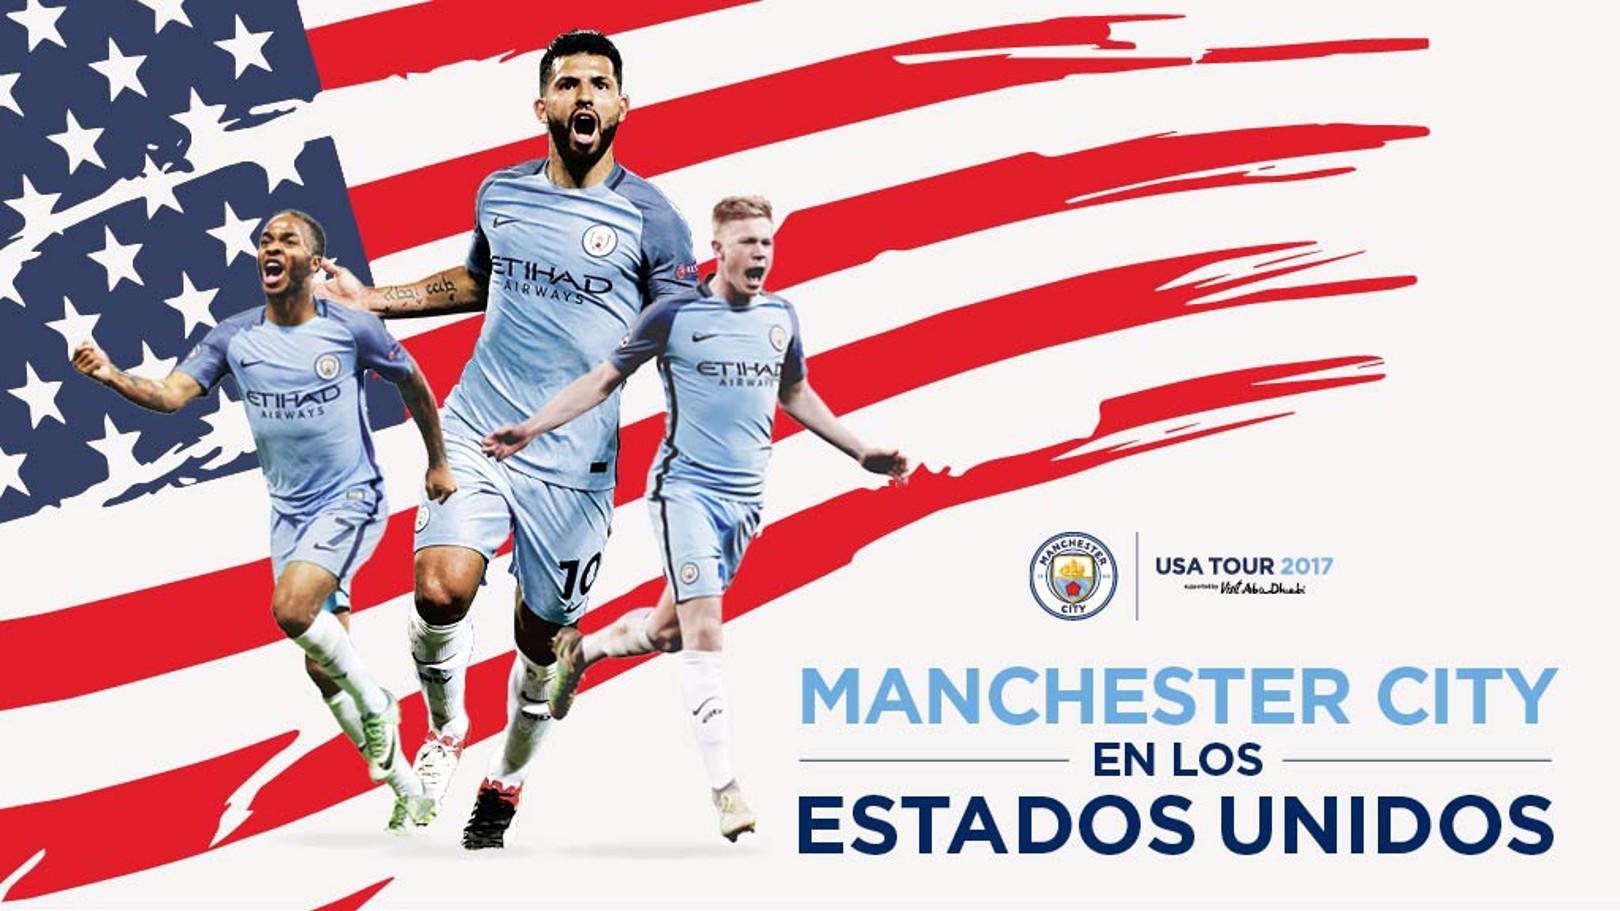 USA Tour graphic